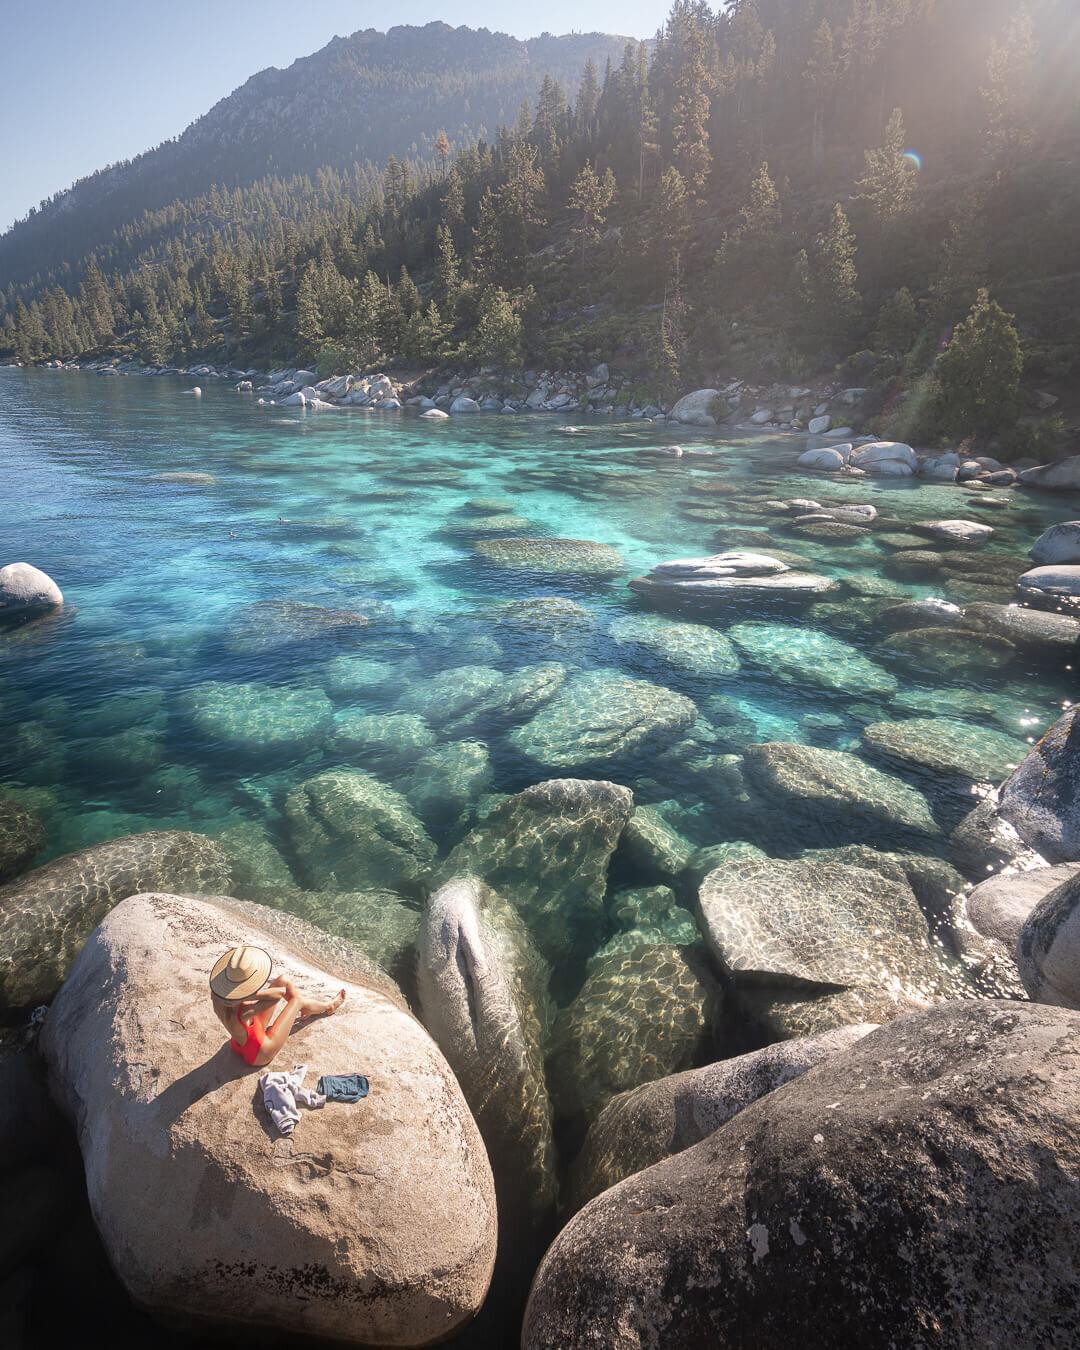 Sunbathing on the rocks at Lake Tahoe.